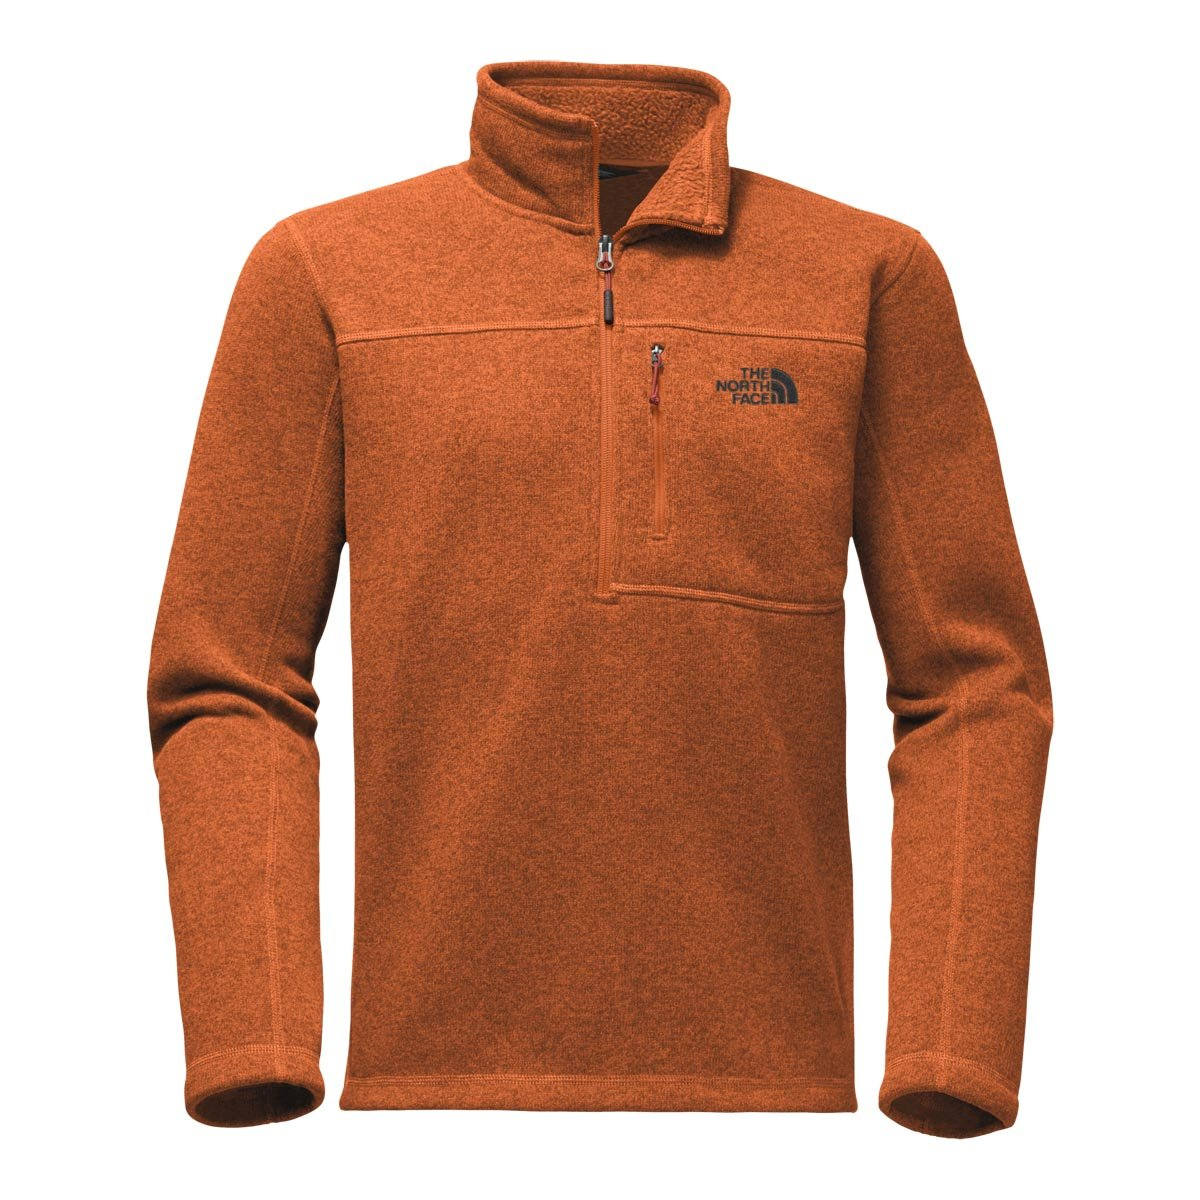 The North Face Men's Gordon Lyons 1 & 4 Zip - Autumnal Orange Heather - 3XL (Past Season)